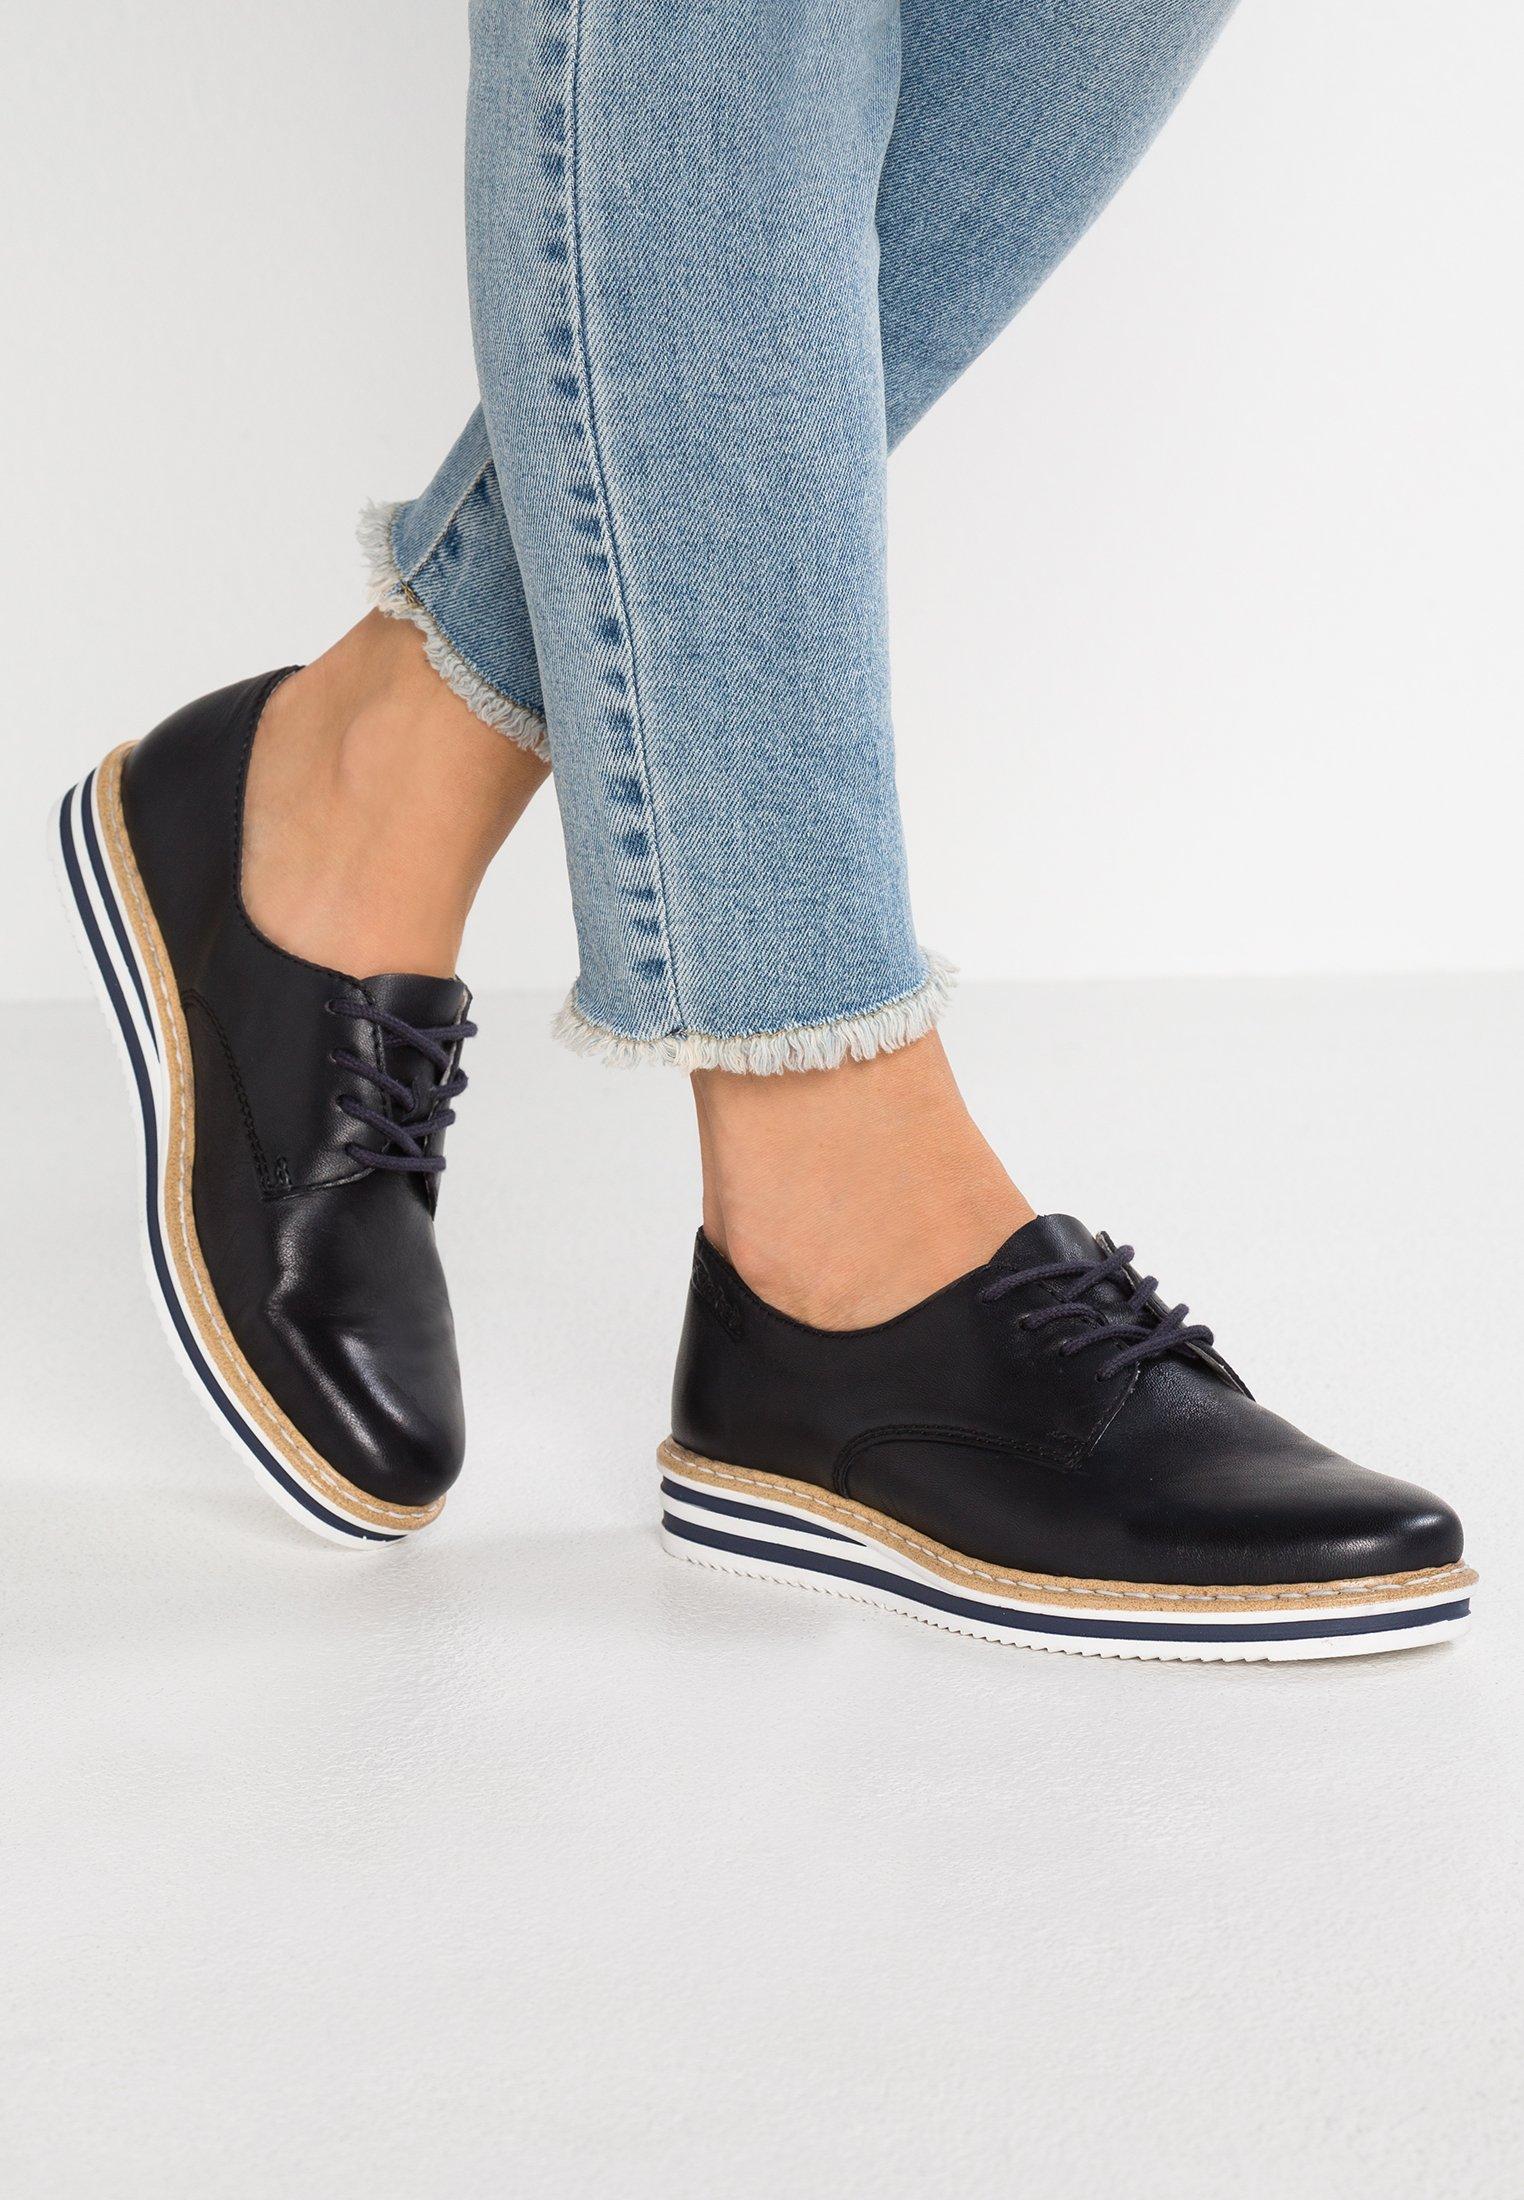 Rieker: Bekleidung und Accessoires Schuhe, Hosen, Tops